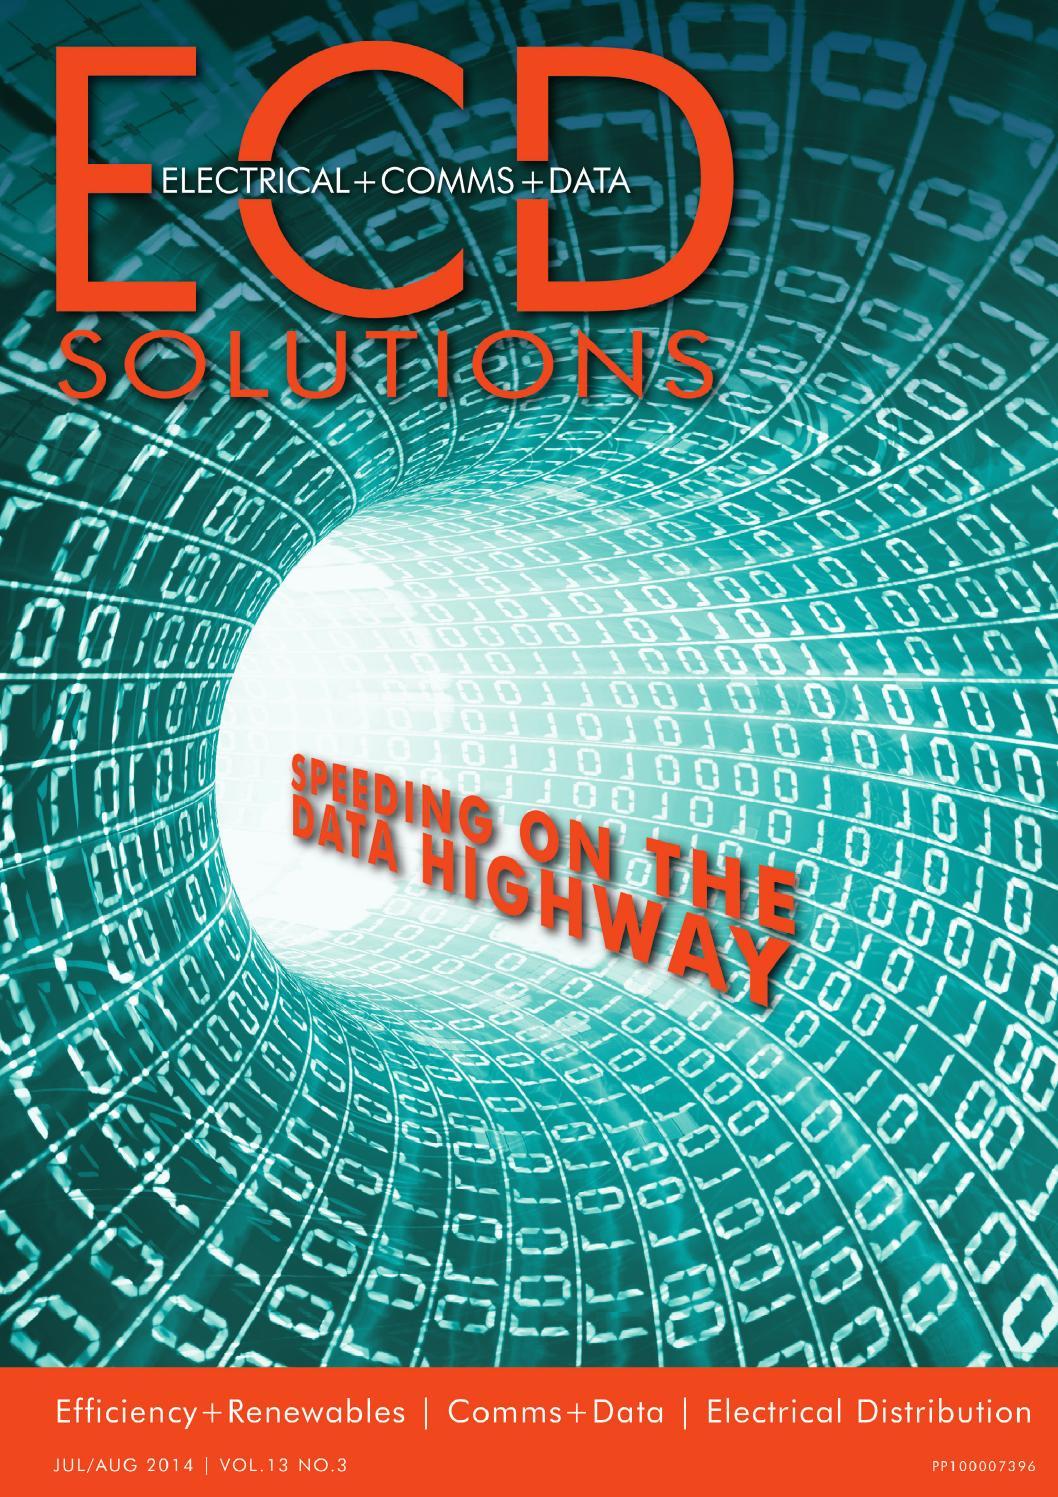 Ecd Solutions Jul Aug 2014 By Westwick Farrow Media Issuu Cat 5 Wiring Diagram Cat5 On Nti